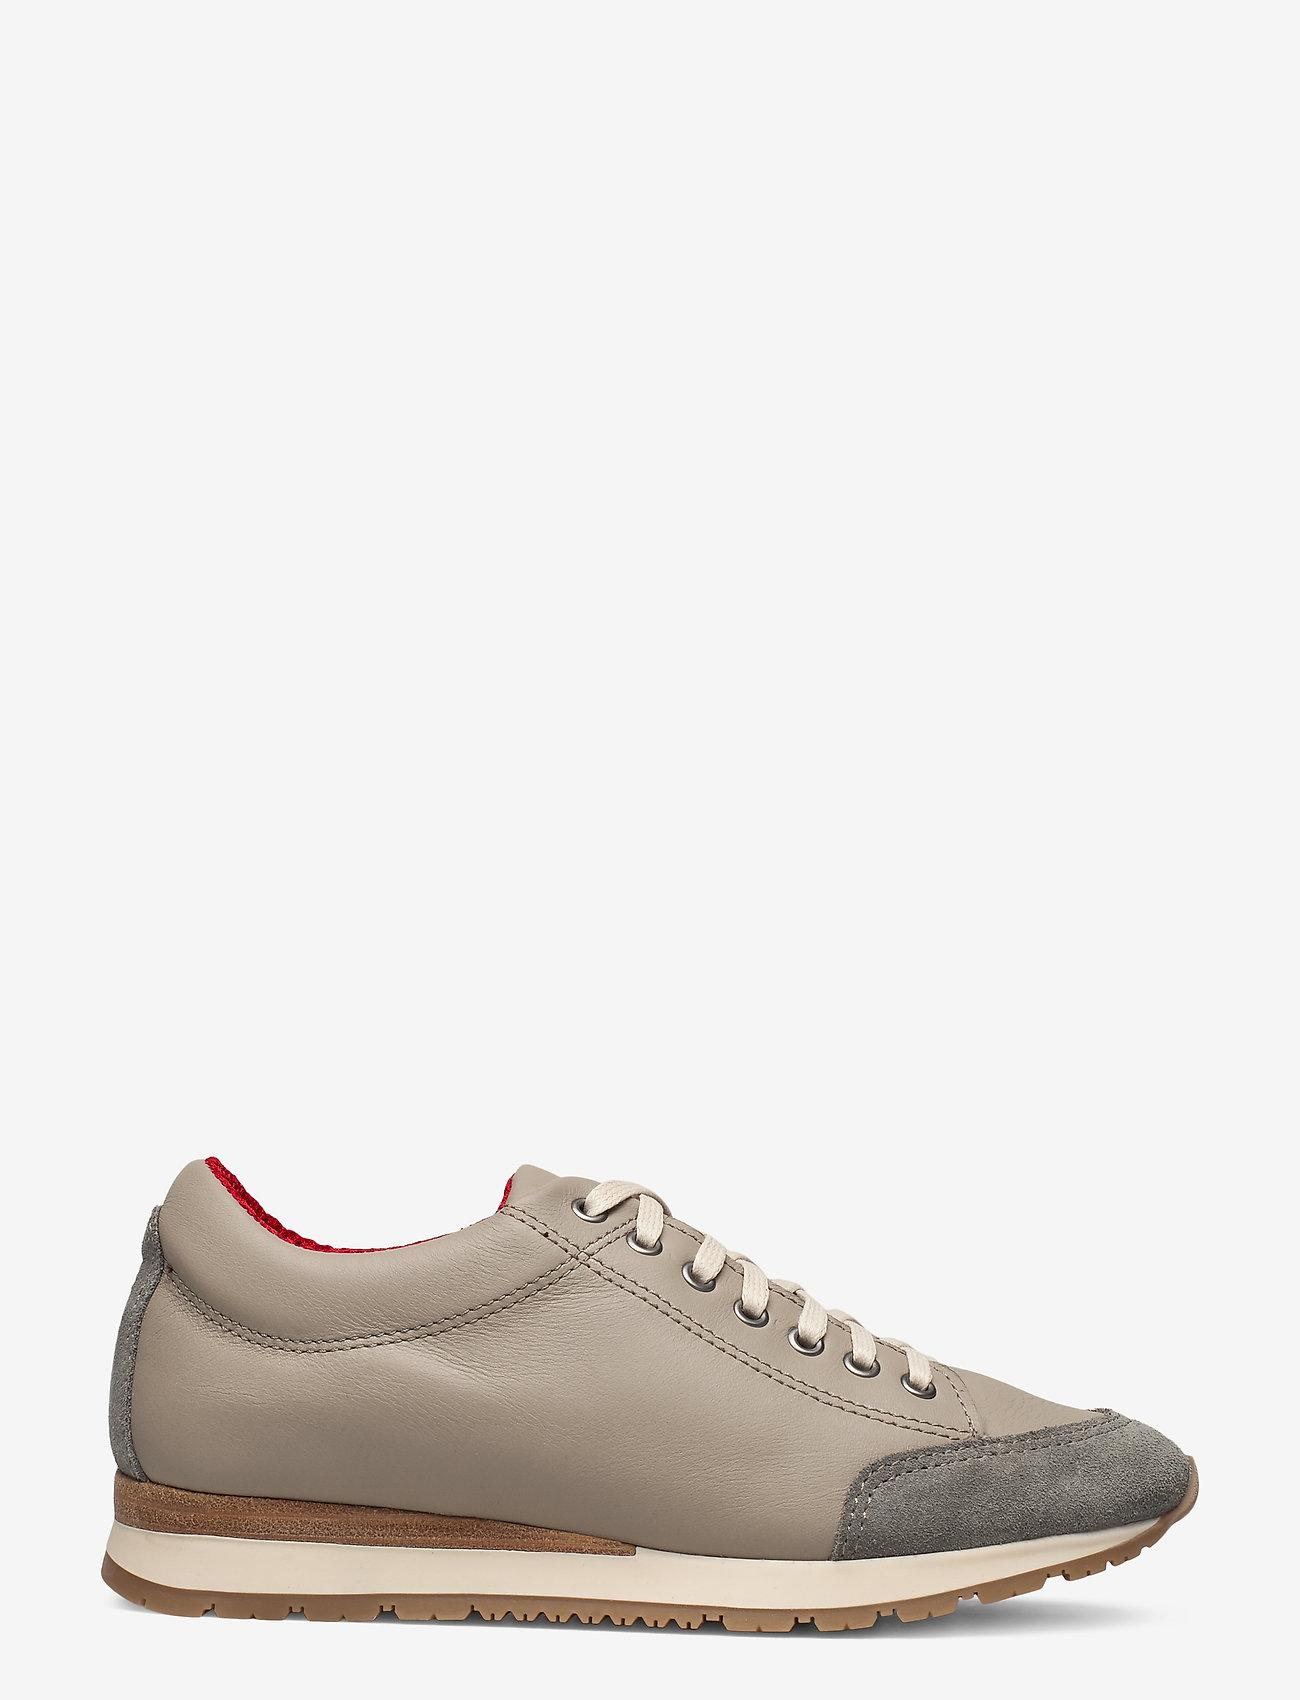 Halti Lodge Low Lthr Shoe - Sneakers